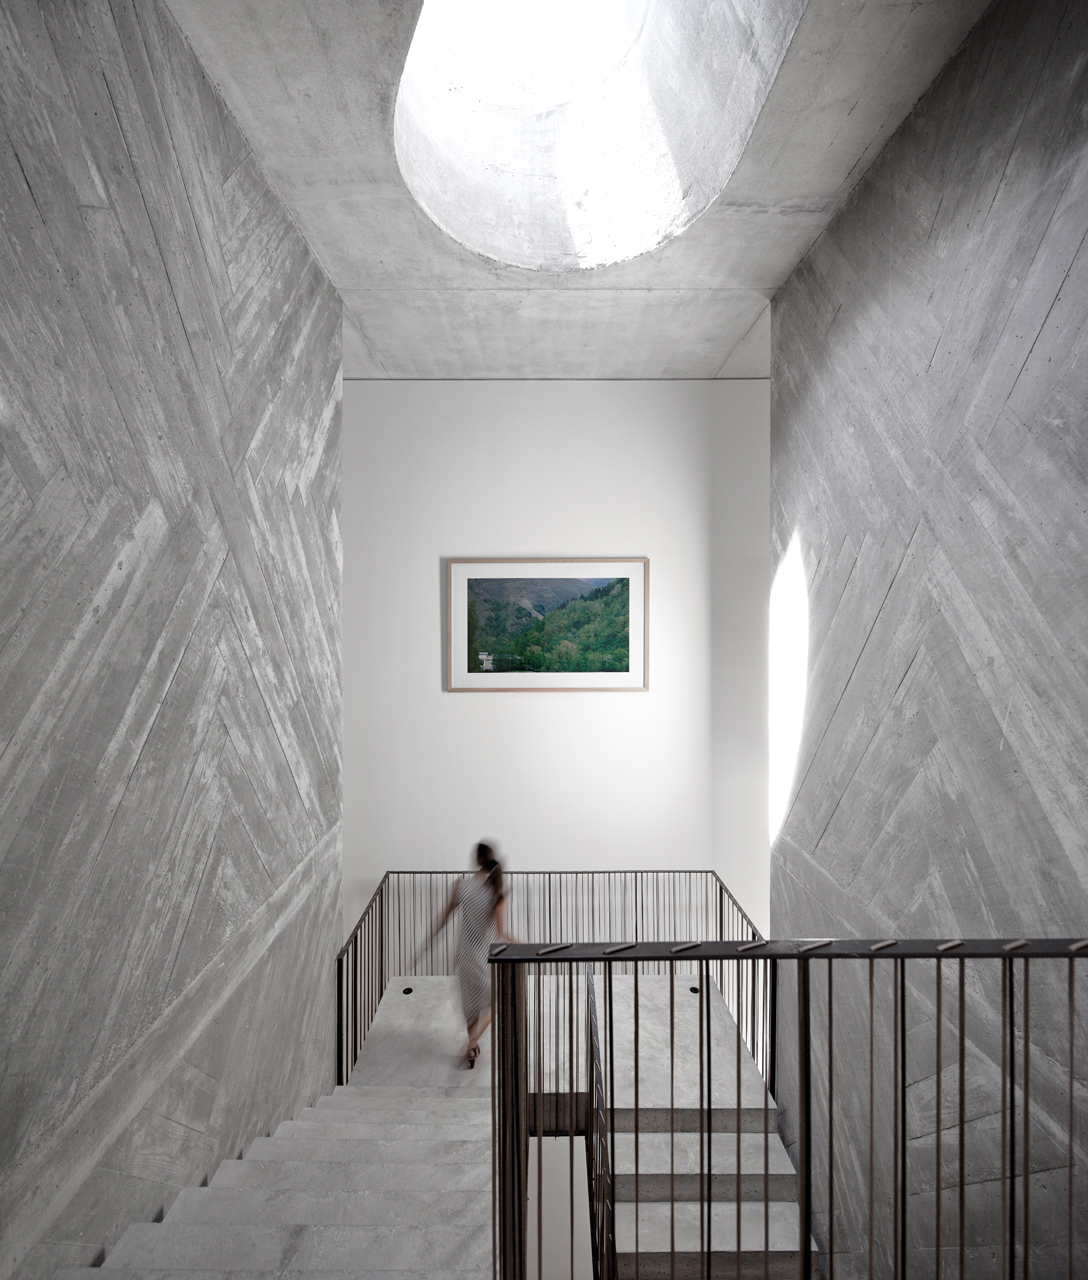 Casa do Conto / Pedra Líquida, © FG+SG – Fernando Guerra, Sergio Guerra